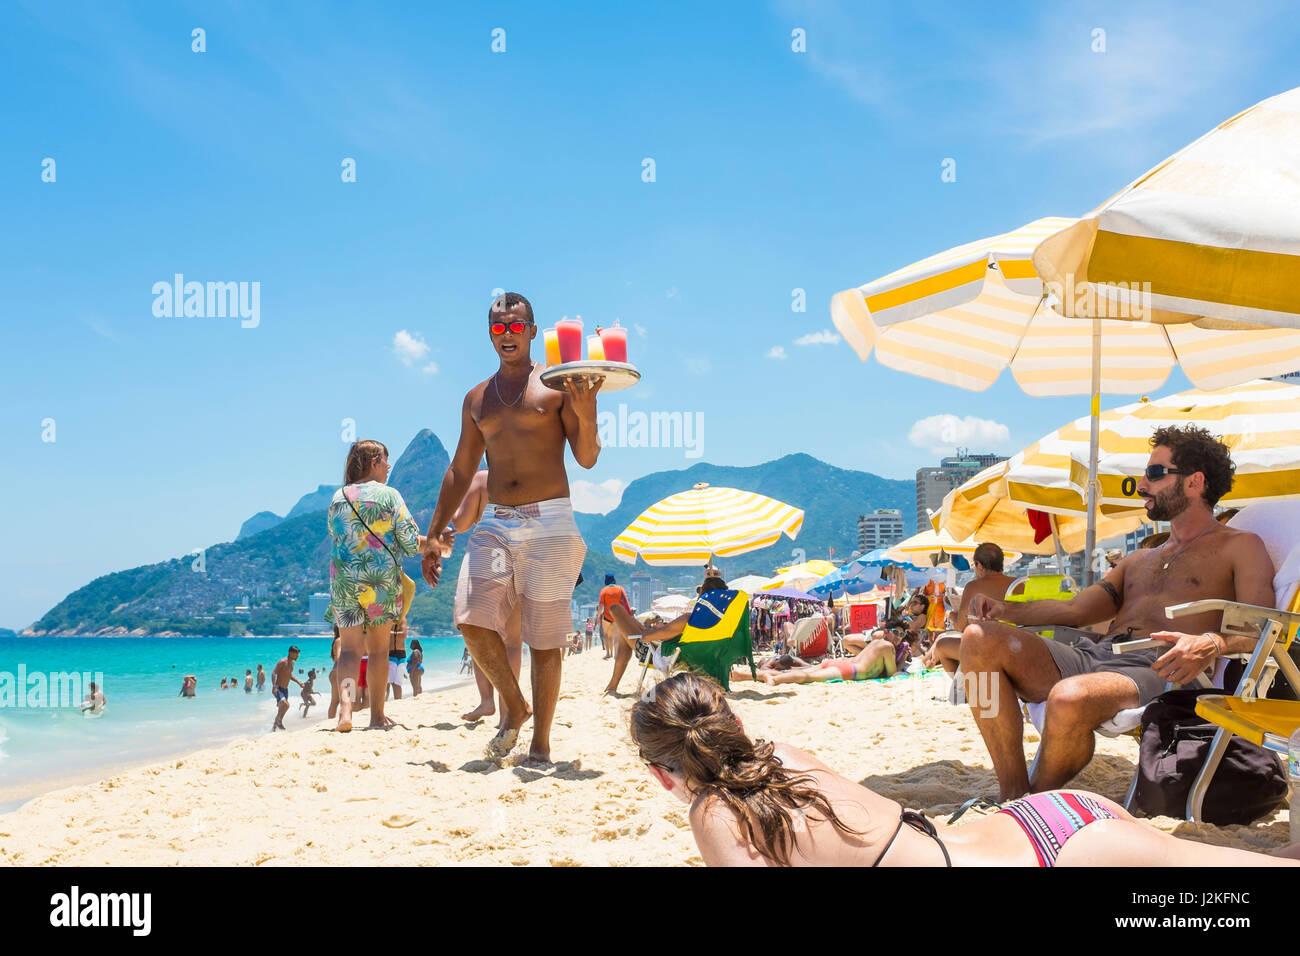 RIO DE JANEIRO - JANUARY 24, 2017: Young Brazilian beach vendor carries a tray of caipirinha cocktails in the midday - Stock Image